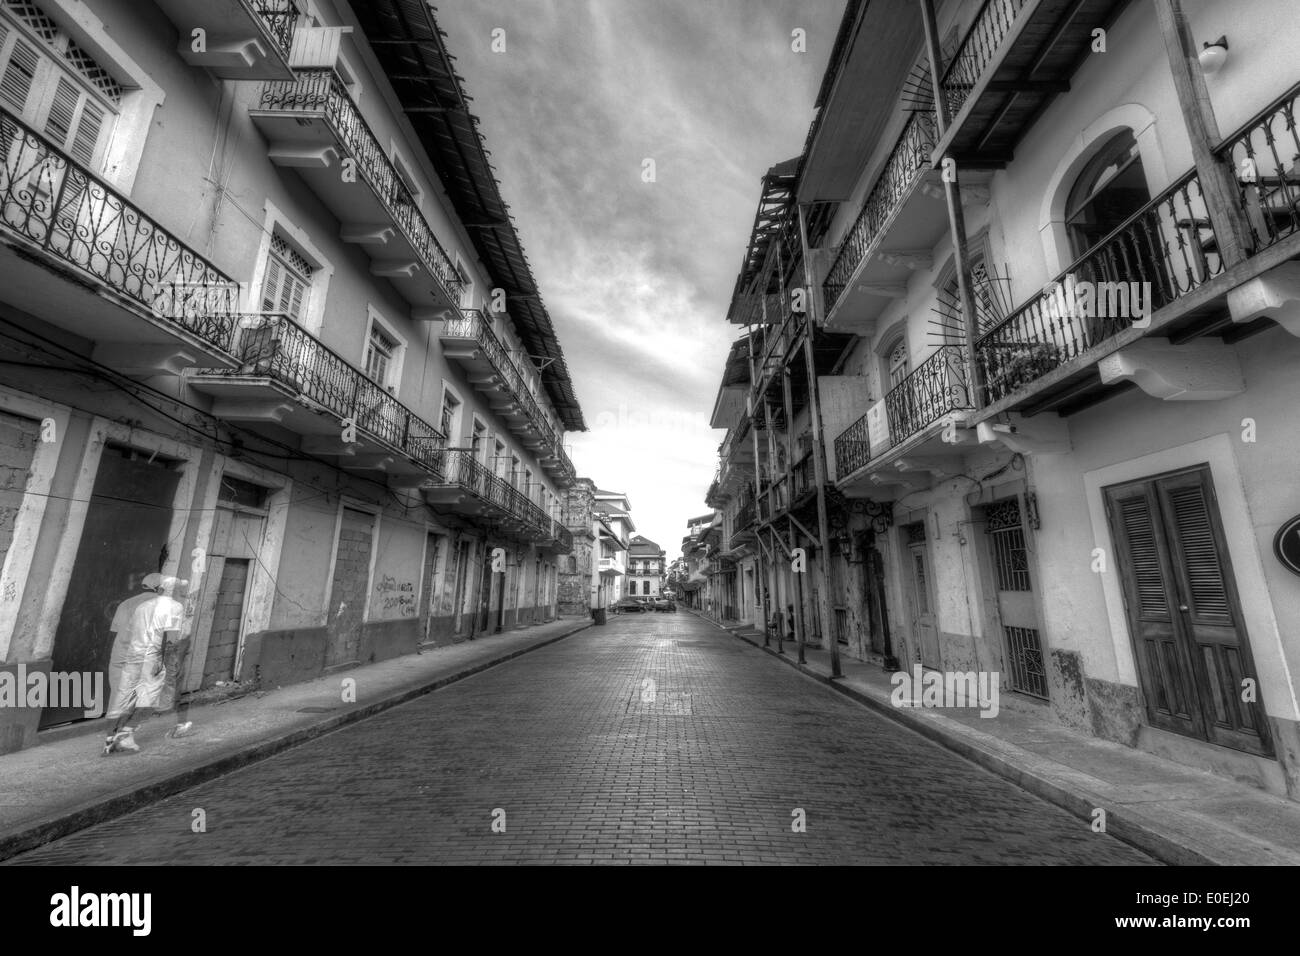 1673 1997 Avenida A Casco Antiguo Casco Viejo Panama City Panamá San Felipe Street Photography World Heritage Site historic dist - Stock Image